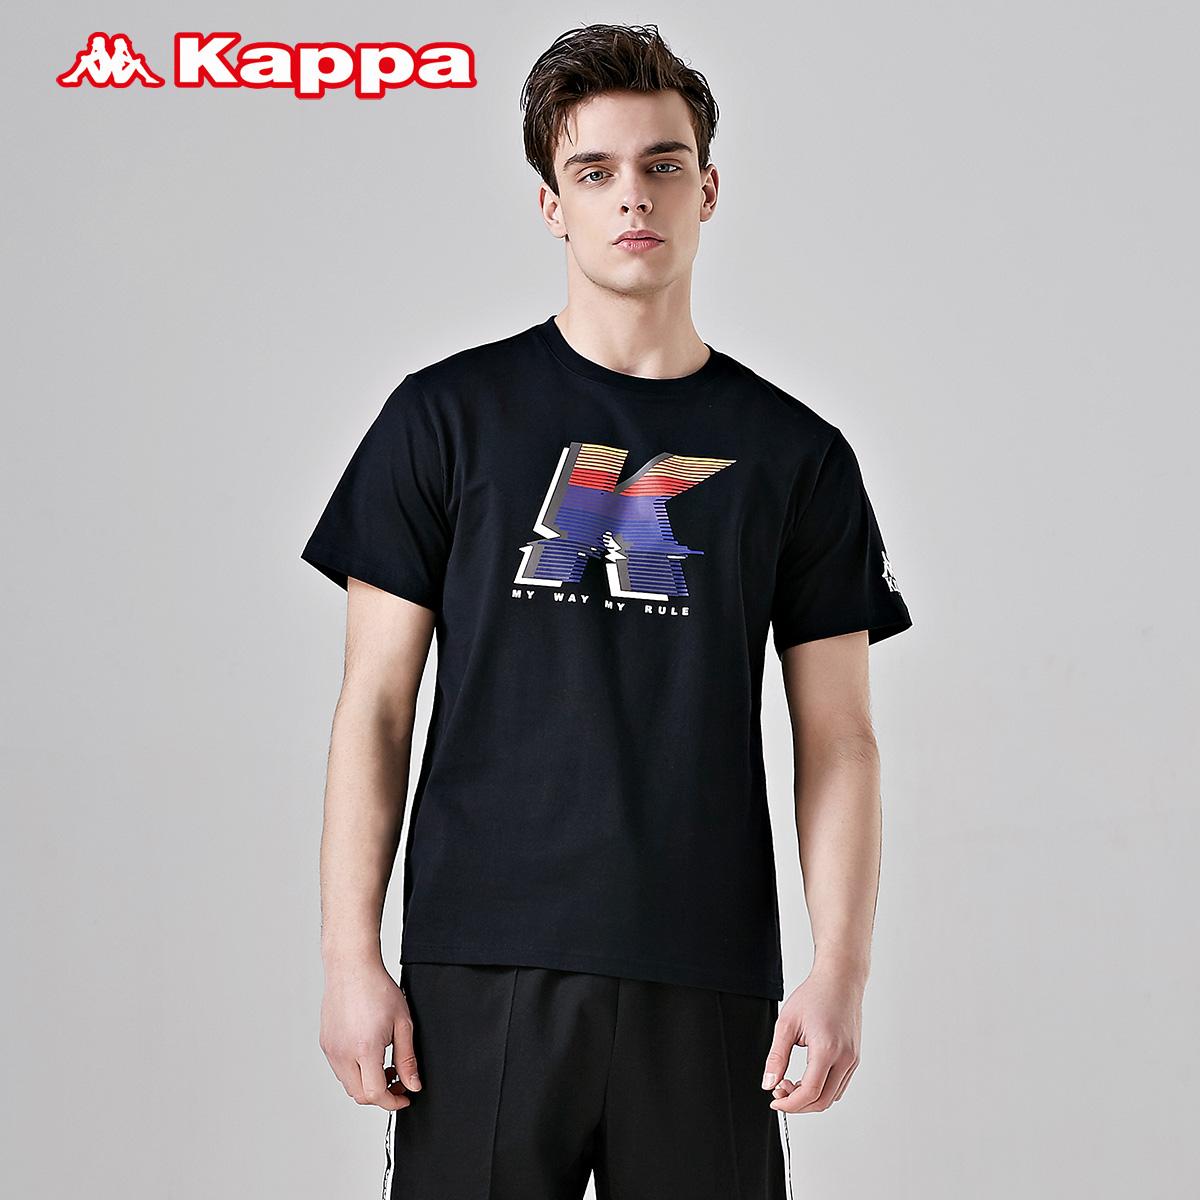 Kappa卡帕男款休闲短袖运动T恤夏季半袖|K0912TD53D